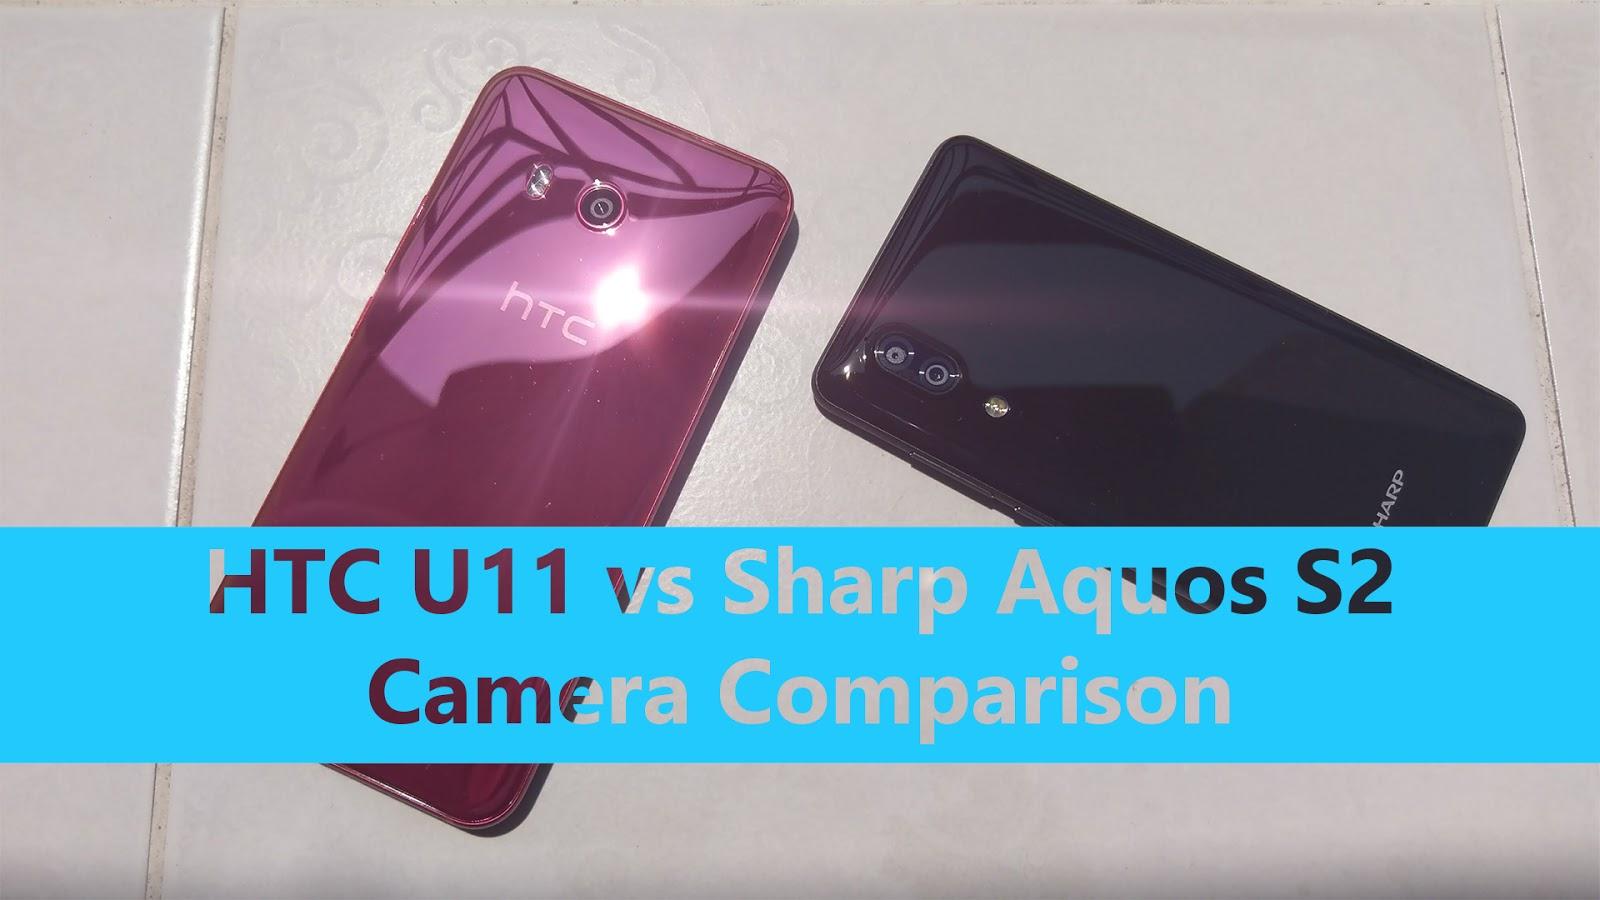 HTC U11 vs Sharp Aquos S2 Camera Comparison: Is Flagship